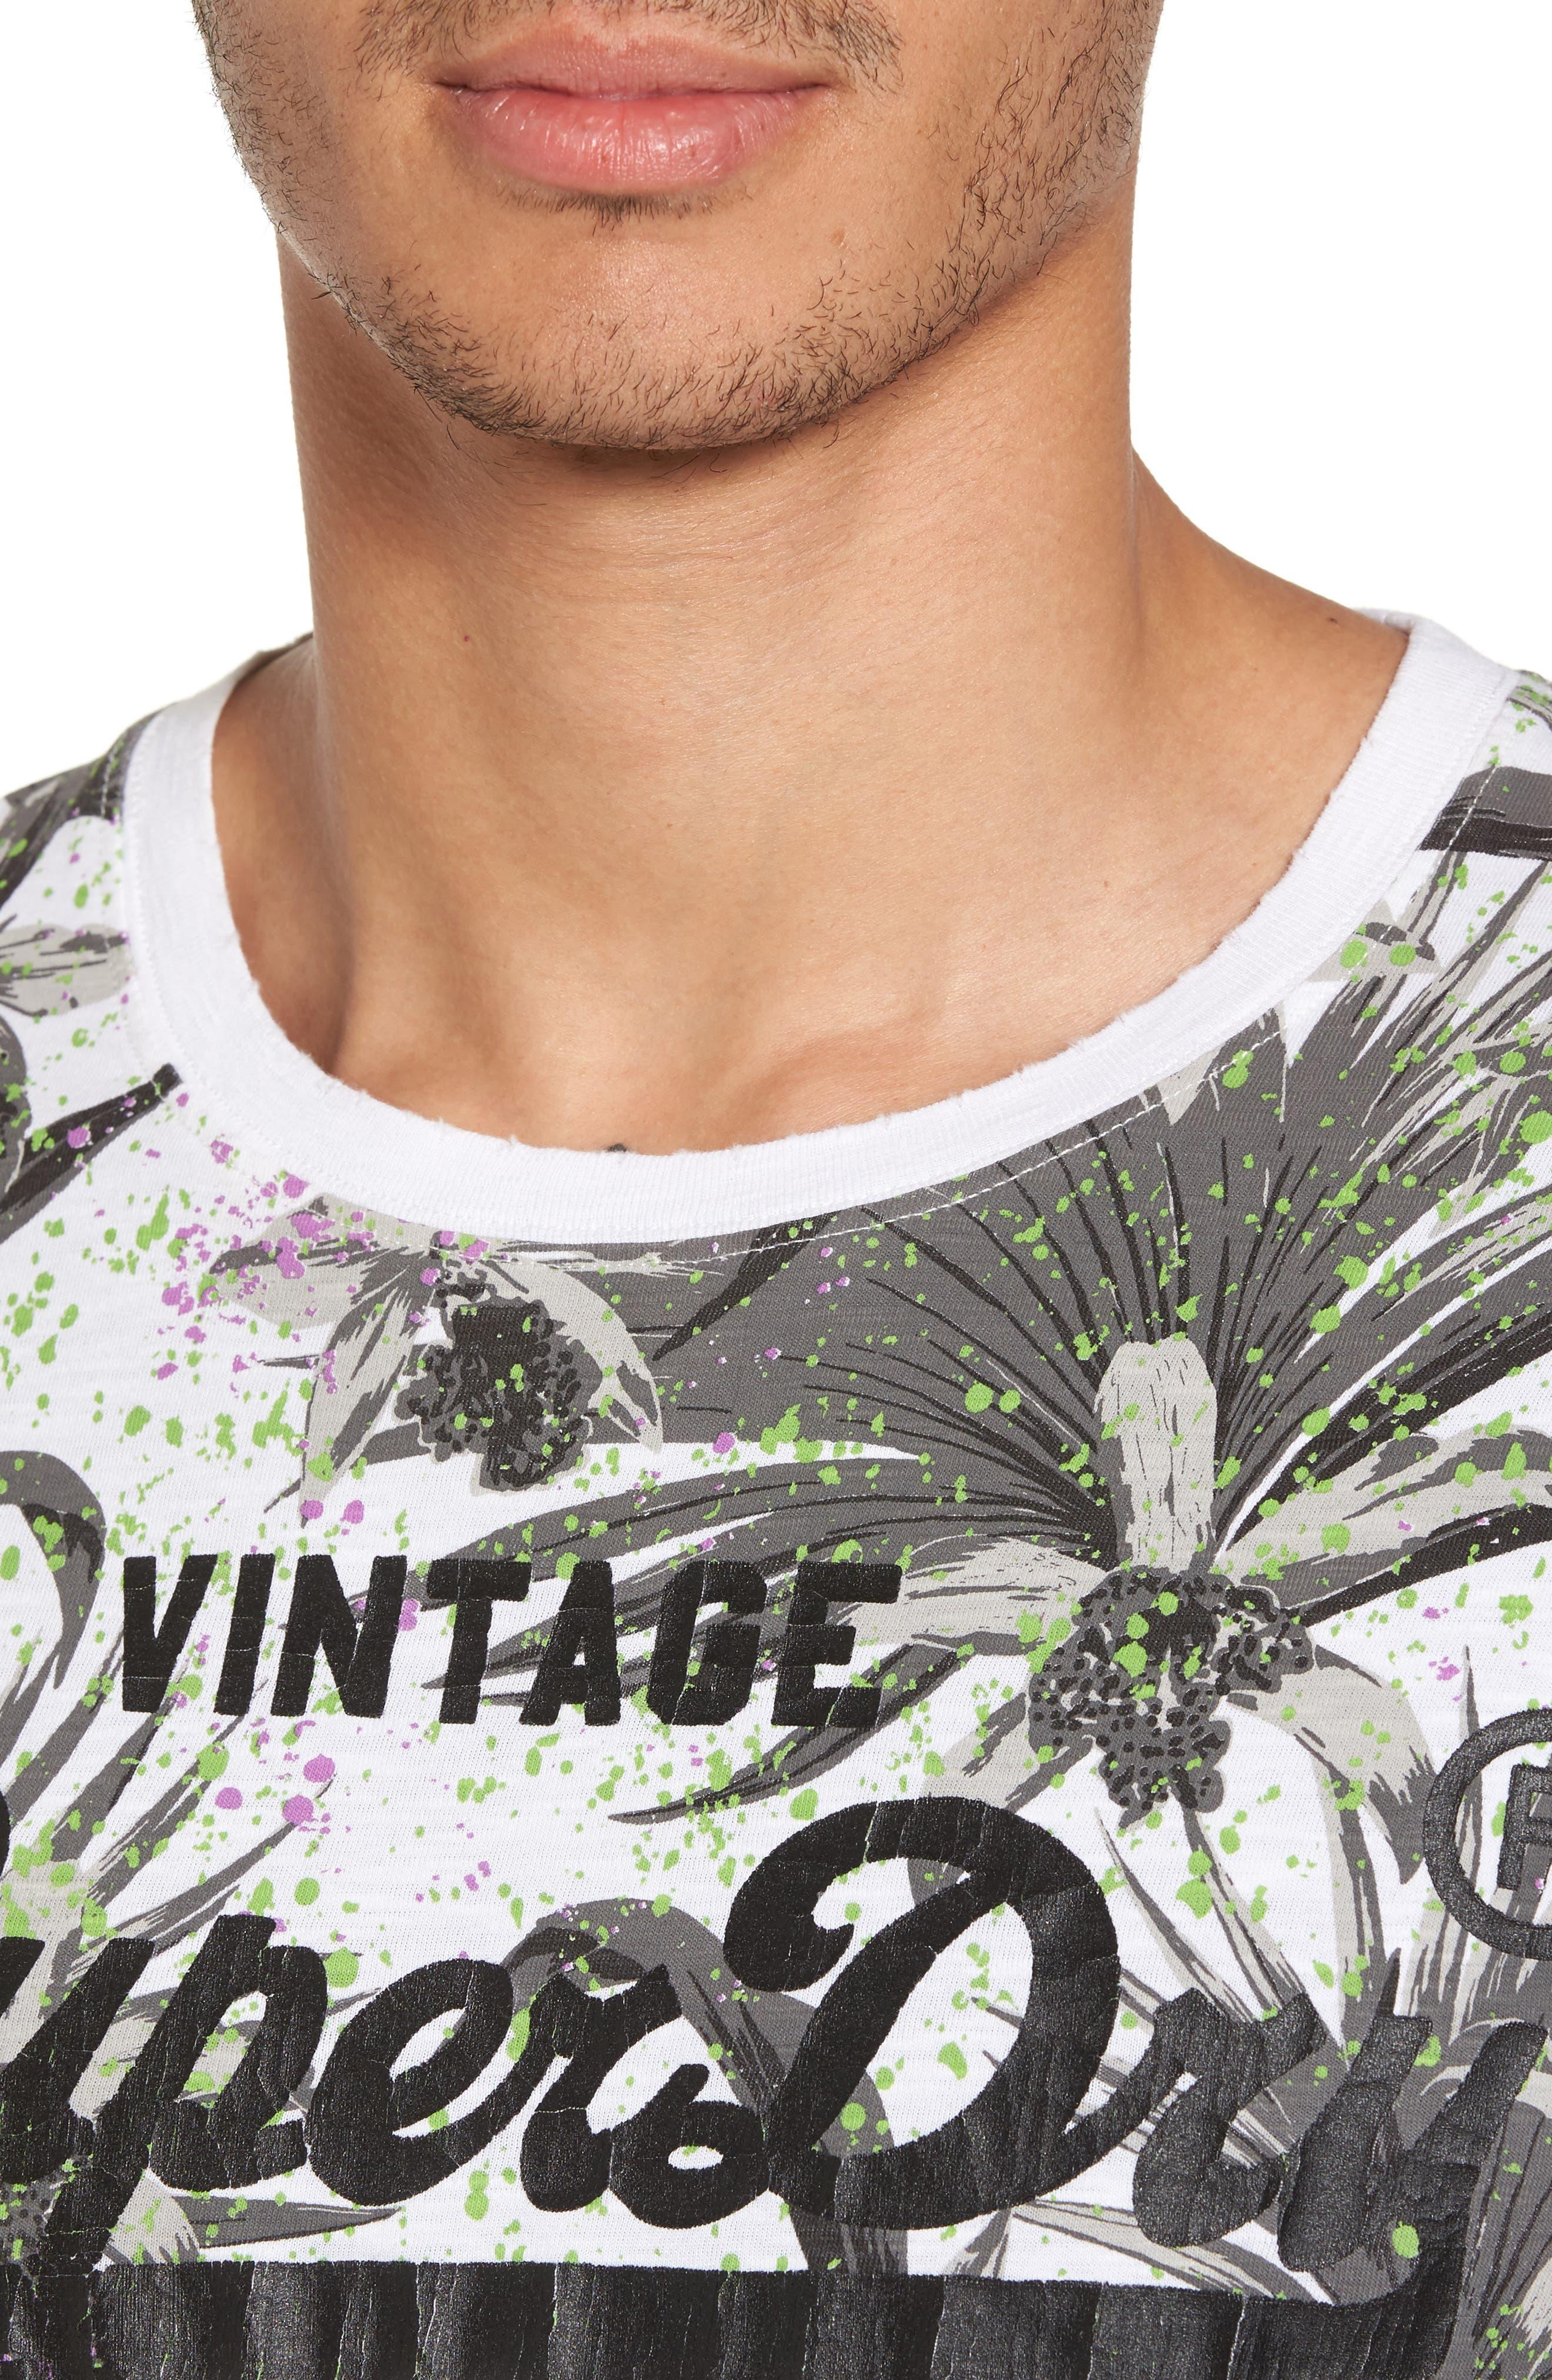 Shirt Shop Aop T-Shirt,                             Alternate thumbnail 4, color,                             Optic